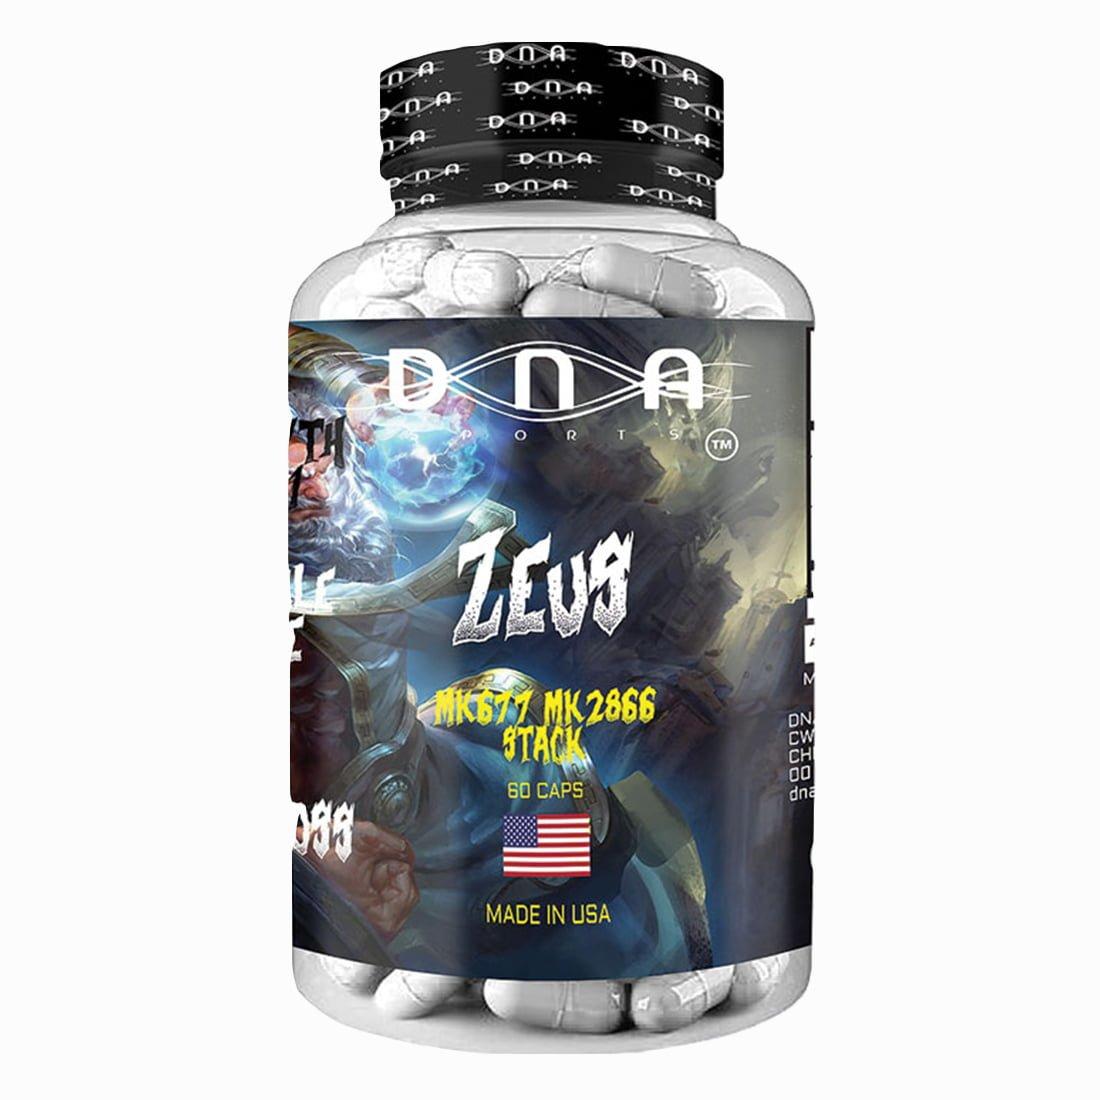 DNA Sports Zeus (MK677 and MK2866)